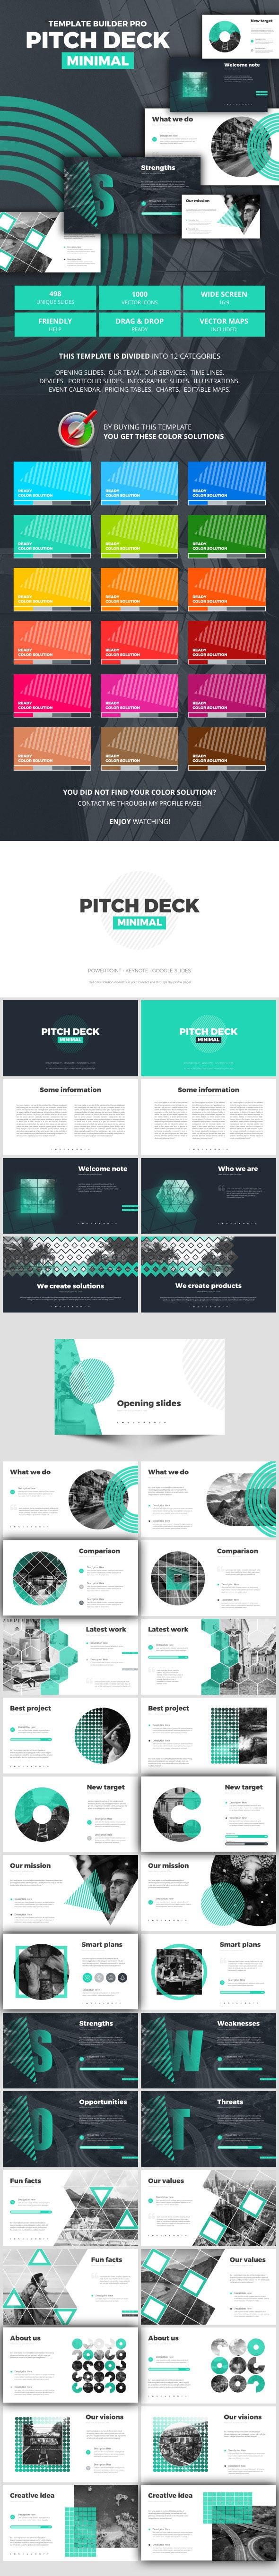 Pitch Deck - Pitch Deck PowerPoint Templates